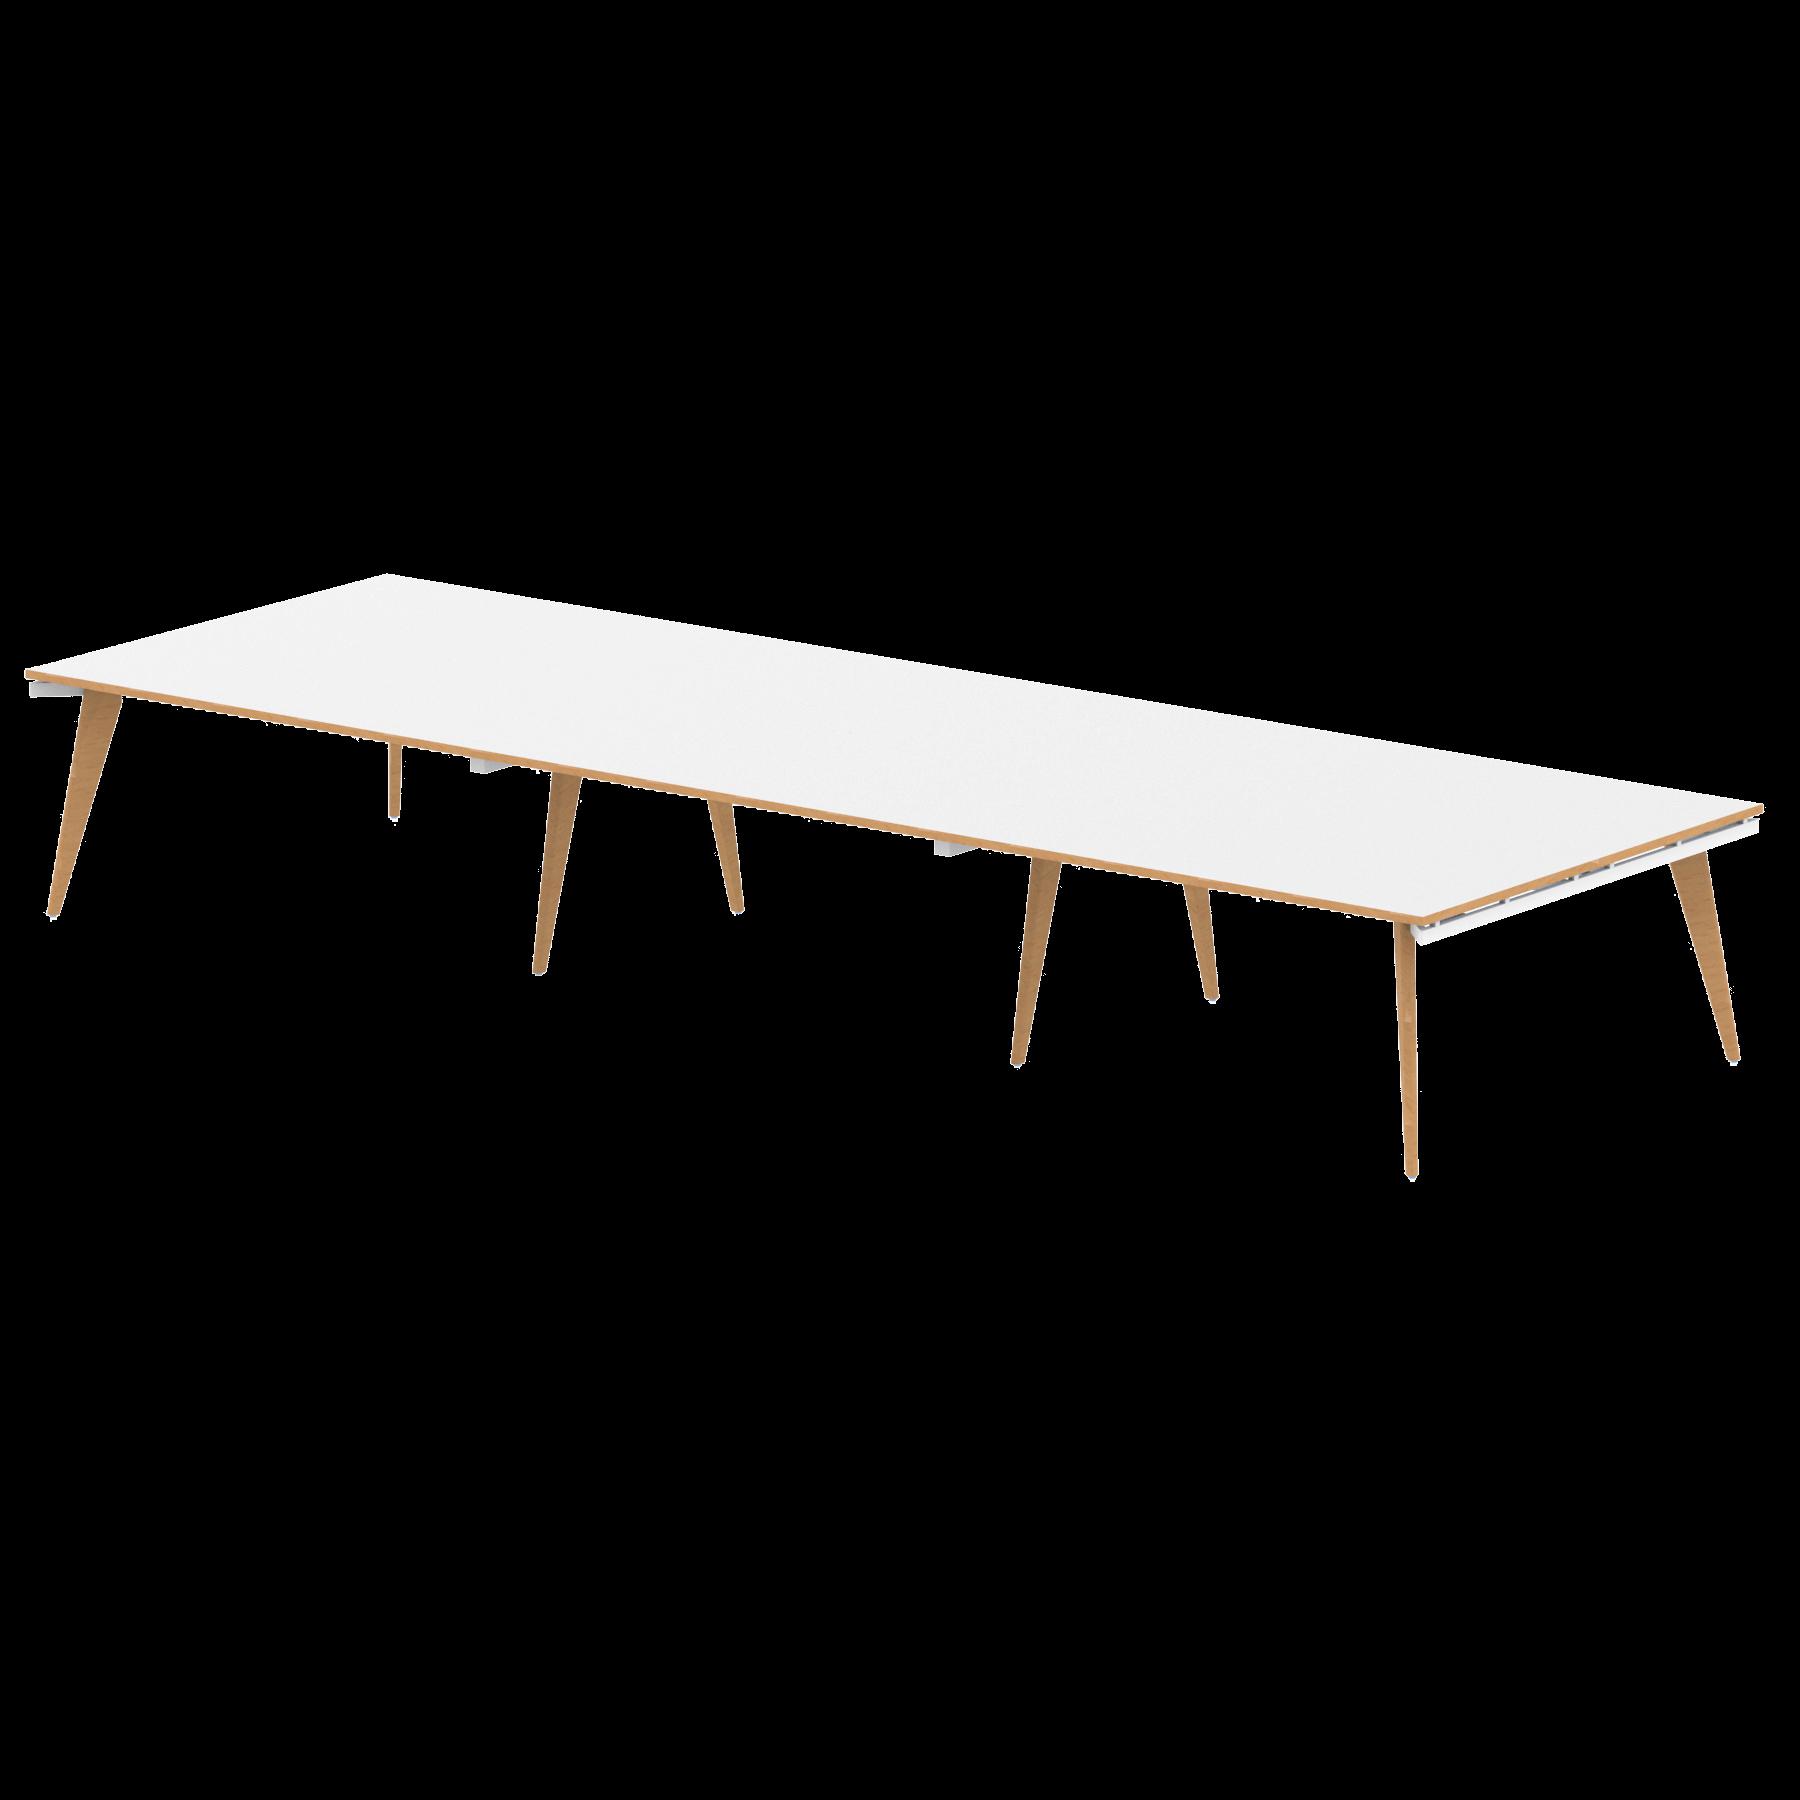 Oslo White Frame Wooden Leg Rectangular Boardroom Table 4800 White With Natural Wood Edge (3 pod)